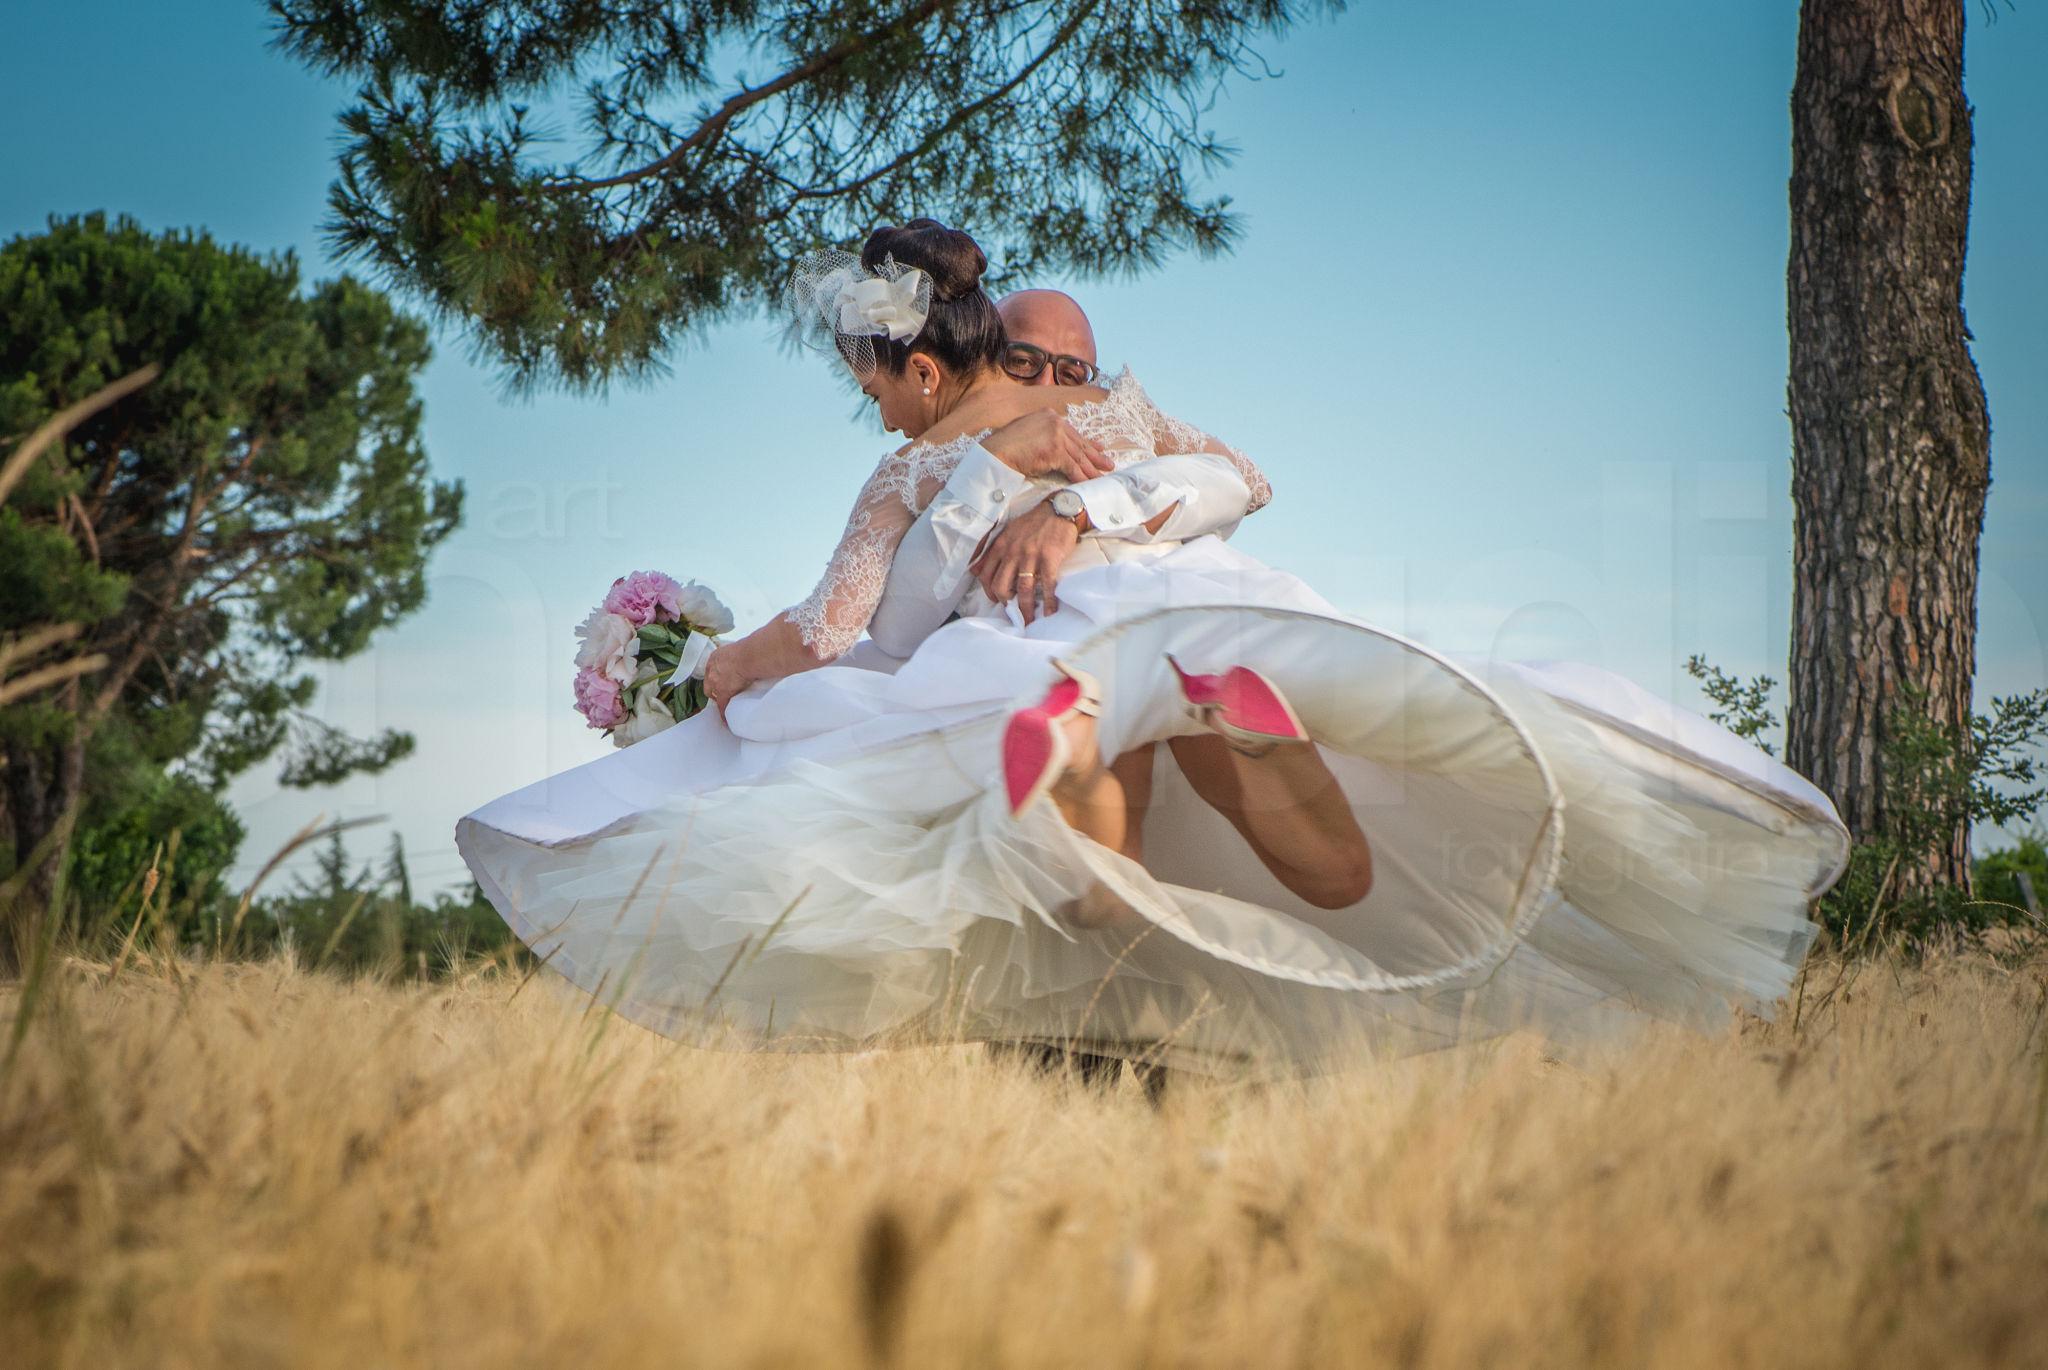 https://lnx.mirkone.it/wp-content/uploads/2015/07/fotografo-matrimoni-faenza-0008.jpg